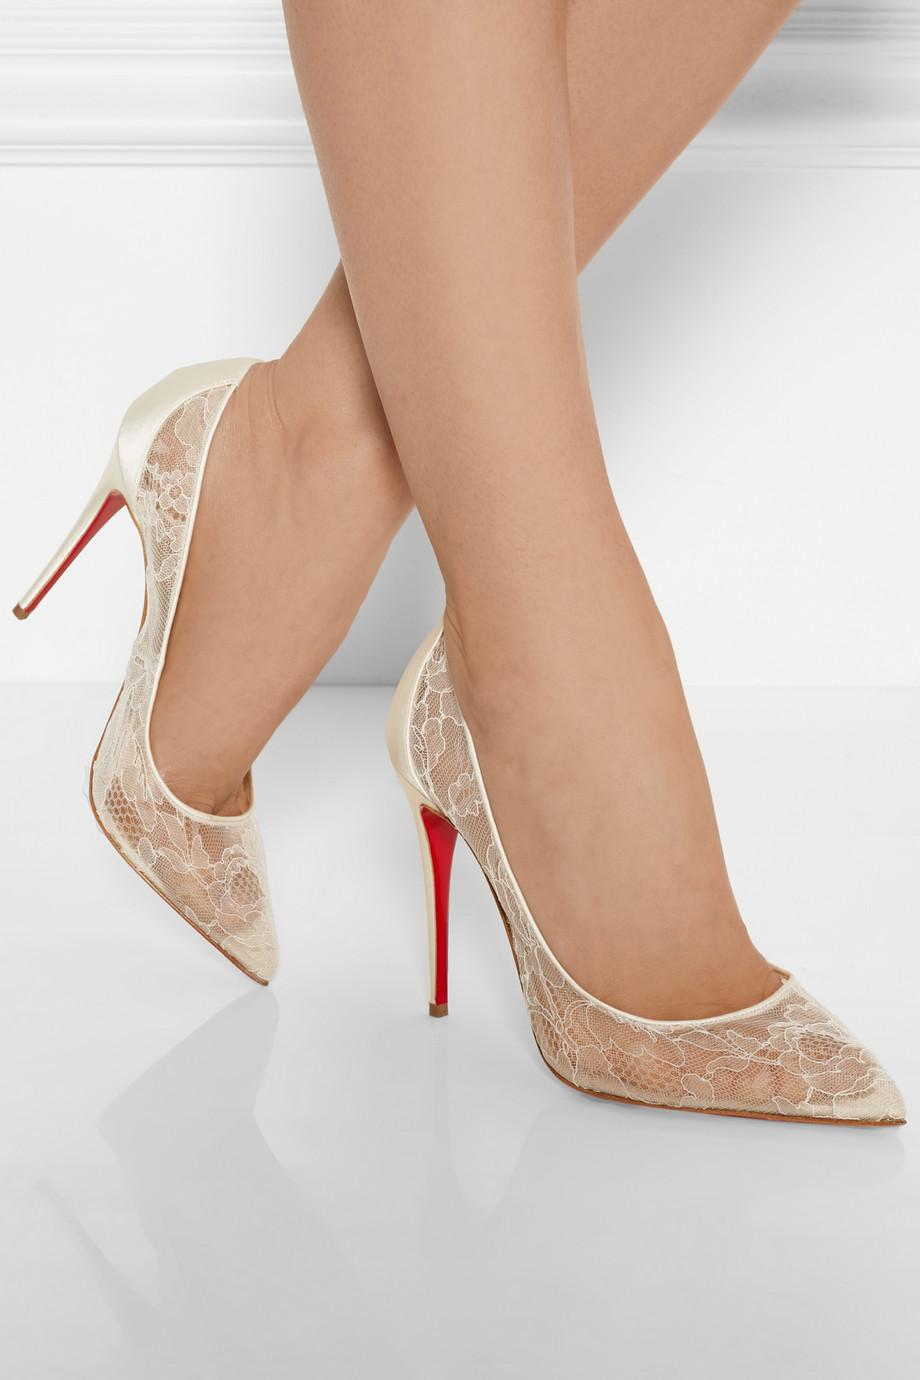 Christian louboutin wedding shoes gold